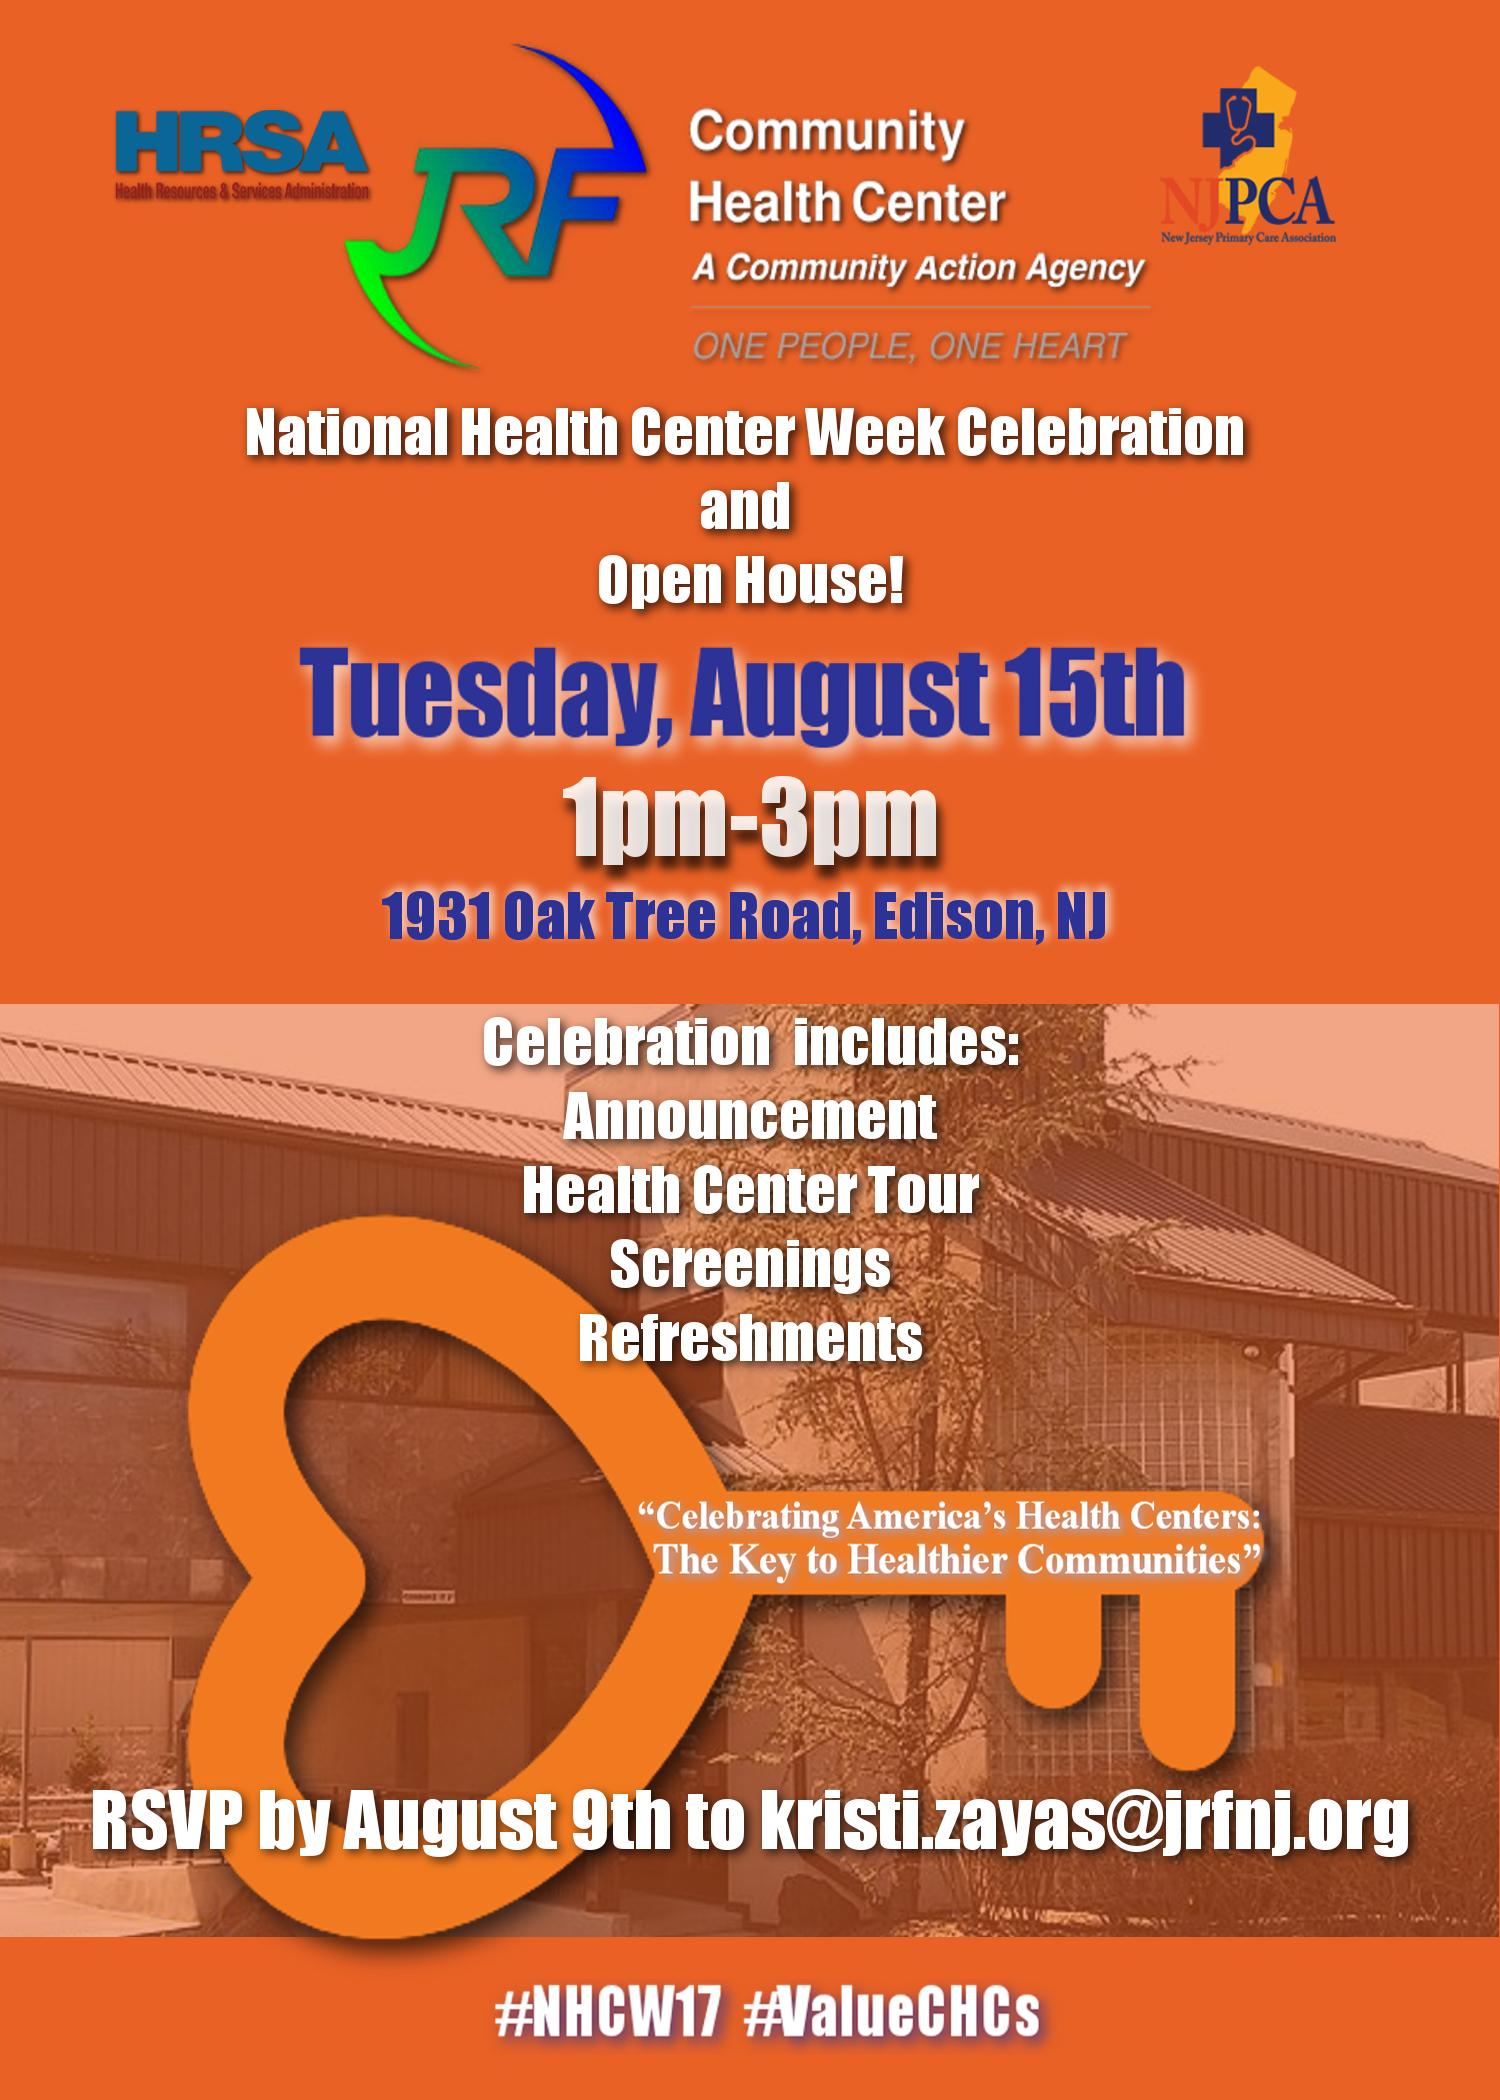 JR CHC National Health Center Week